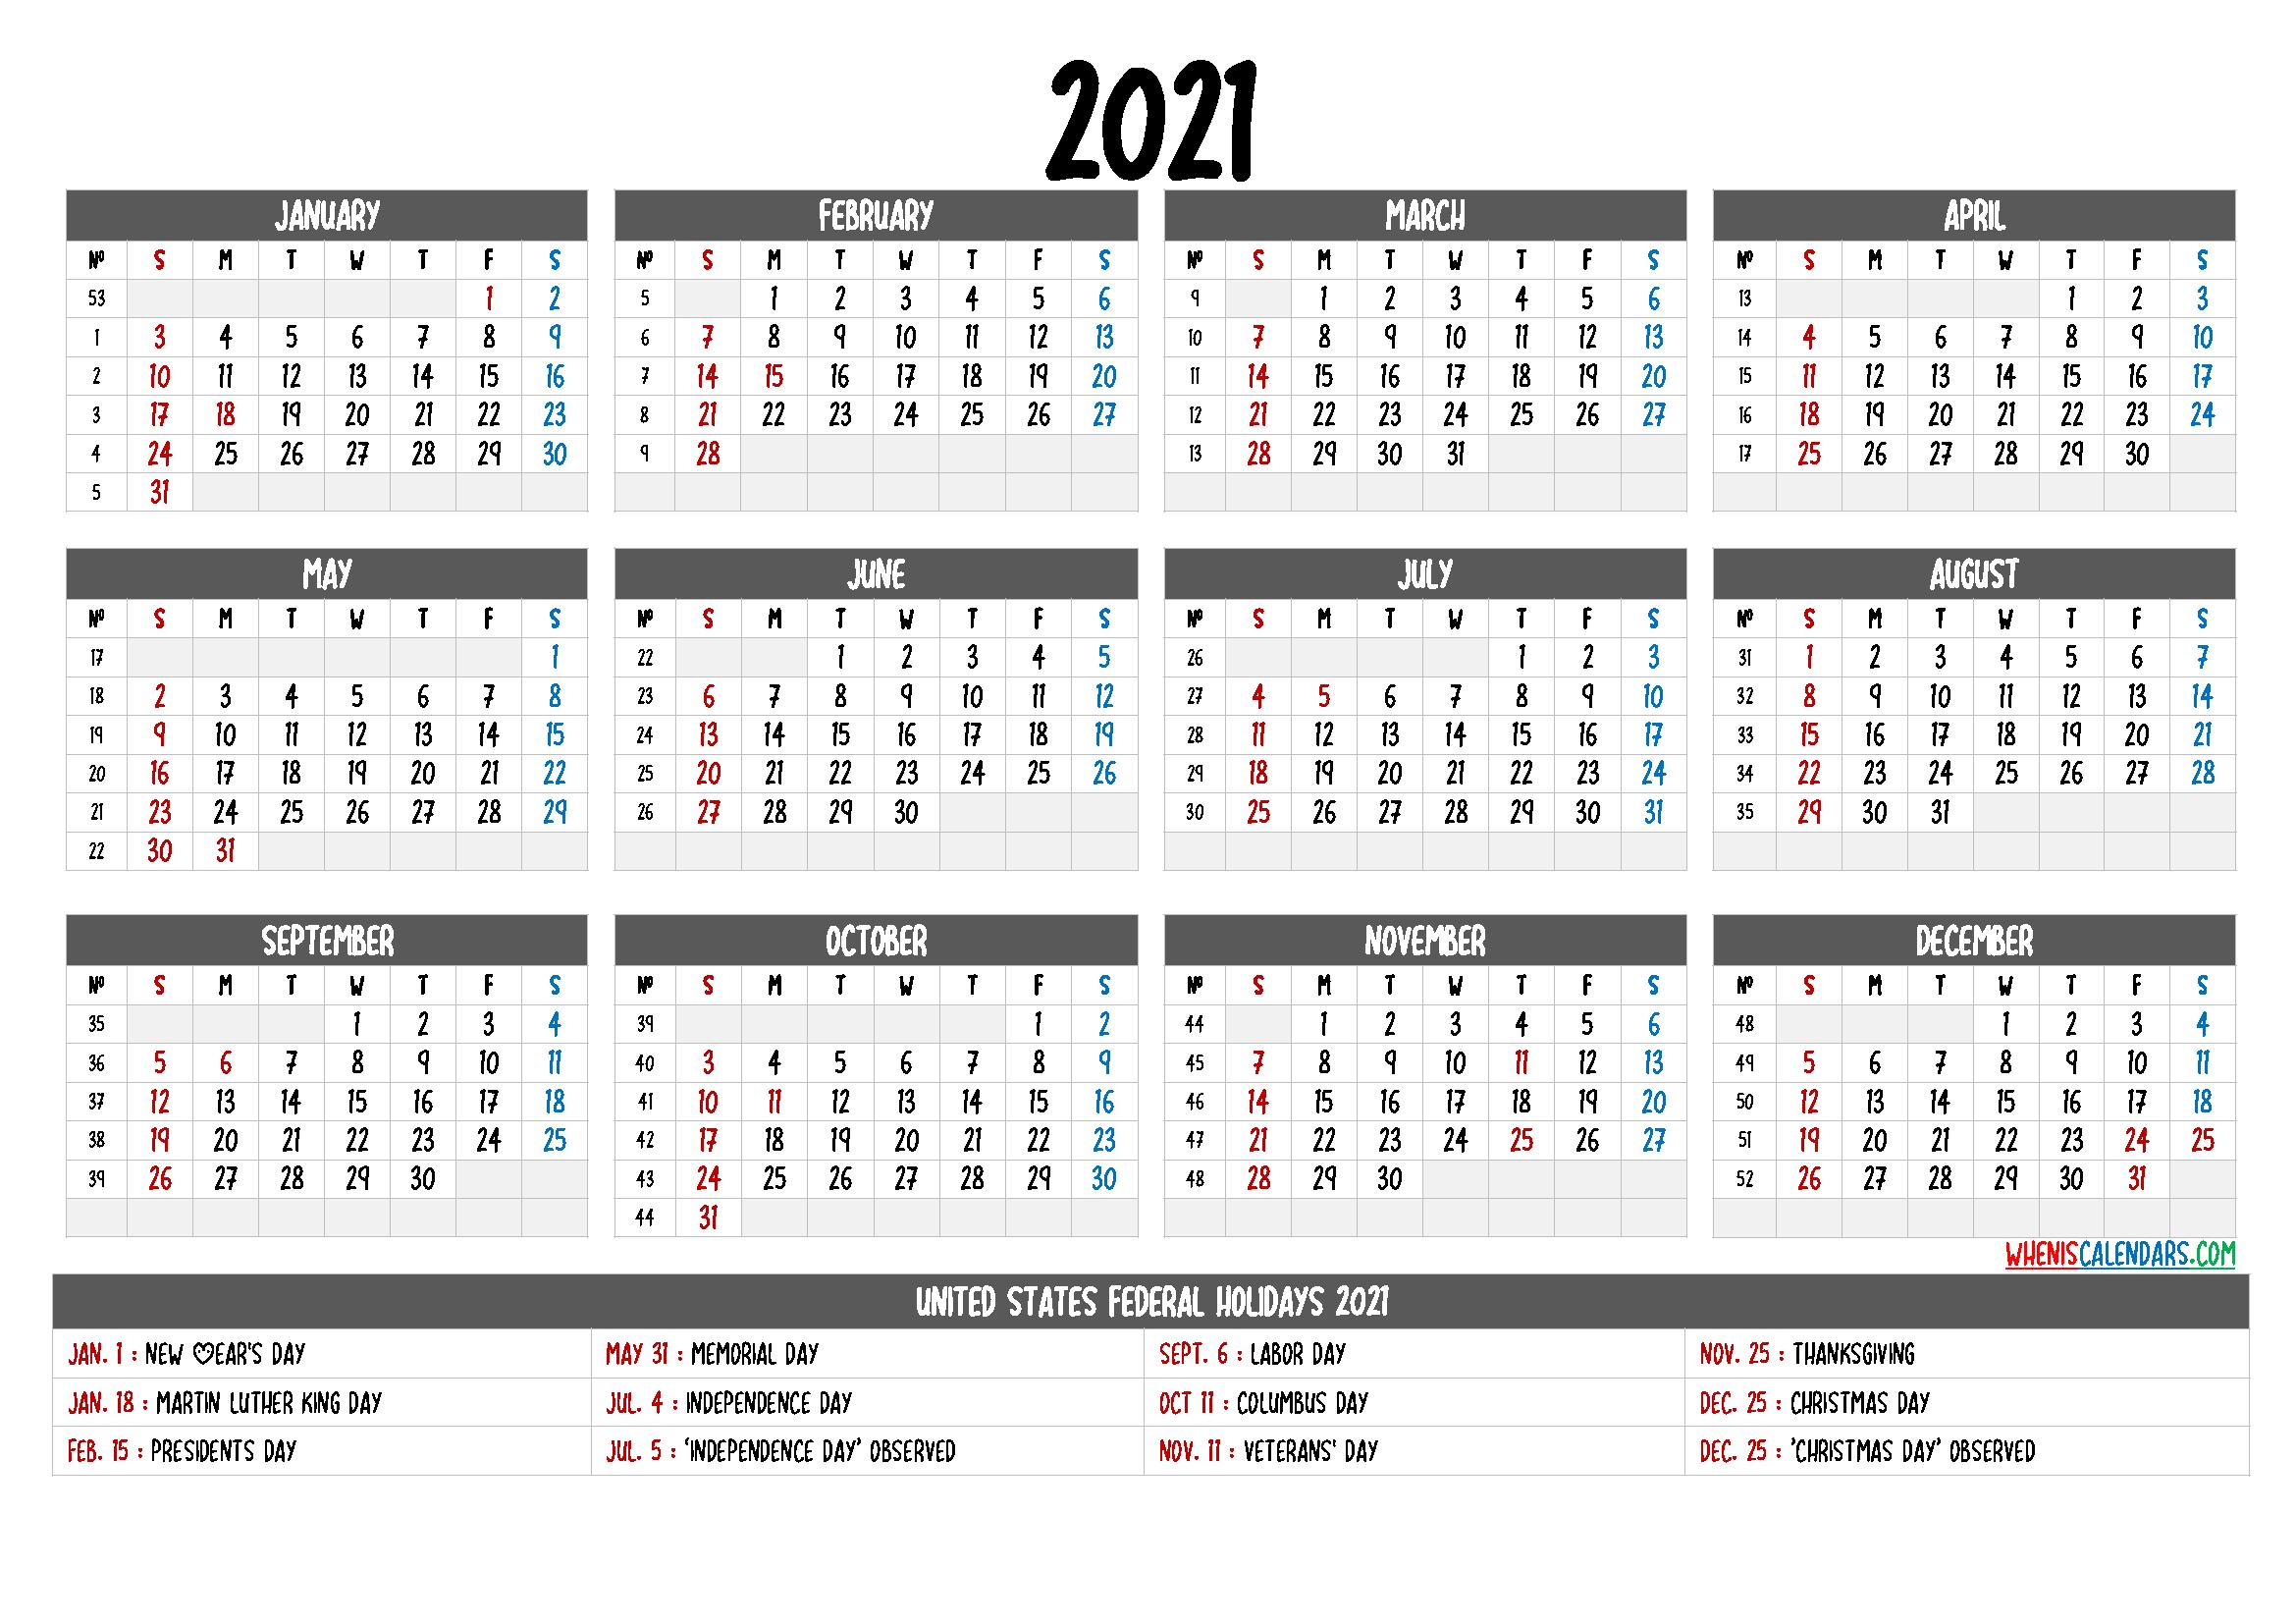 Free Printable Calendar 2021 With Holidays - 12 Templates